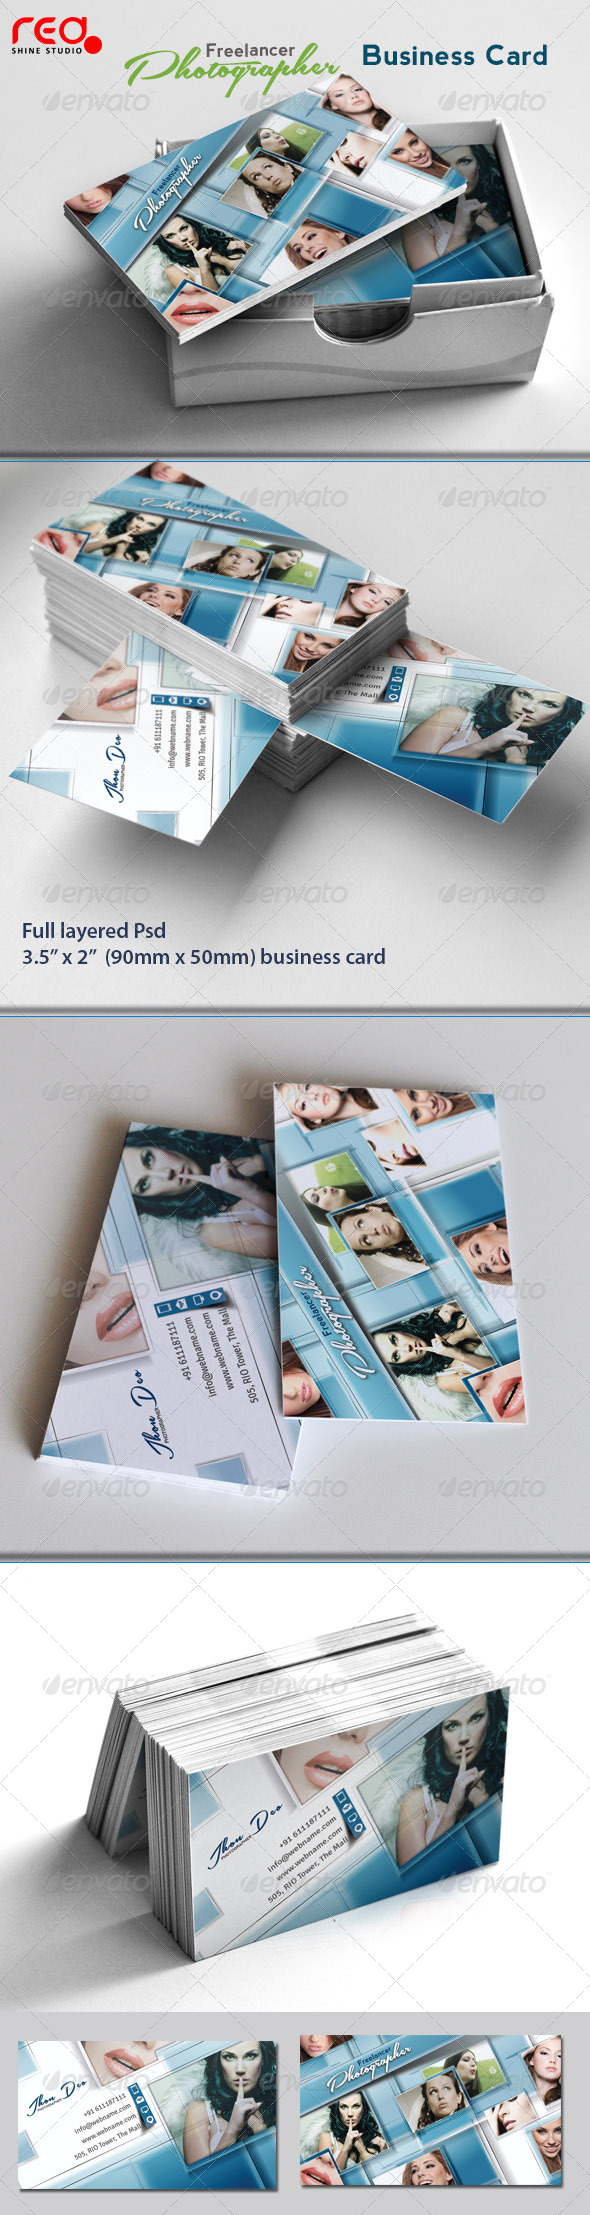 Freelance Photographer Business Card - 01 - Creative Business Cards